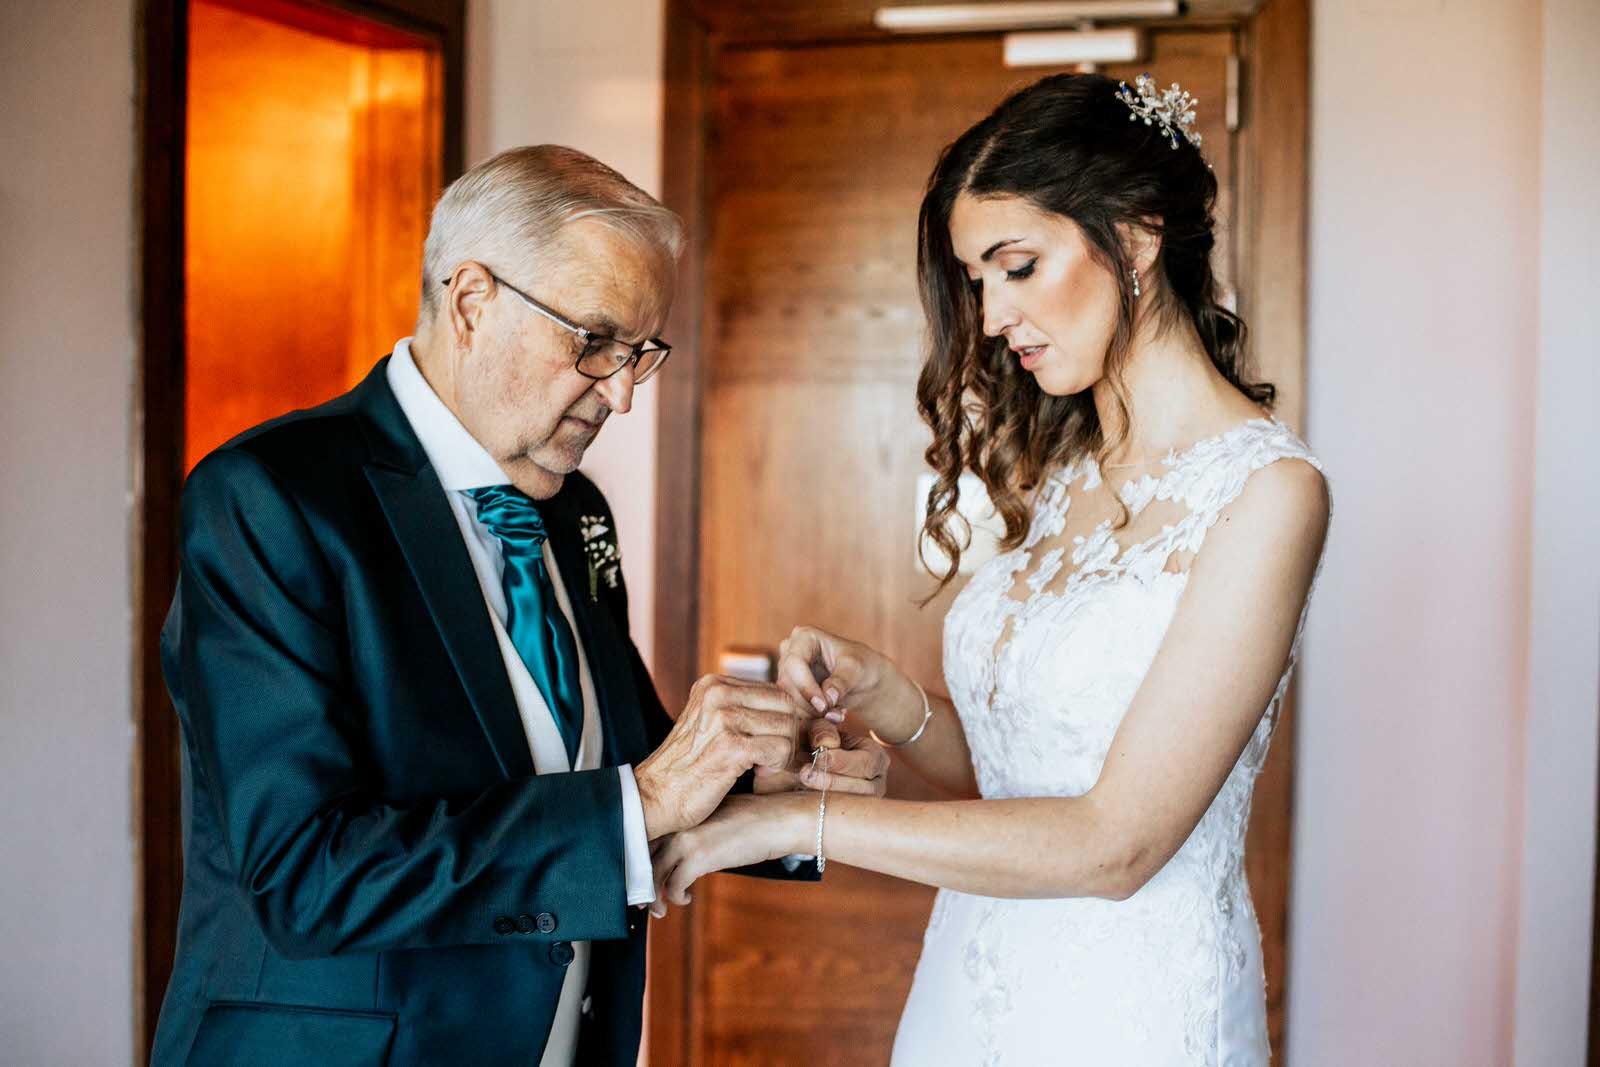 padre ayudando a la novia